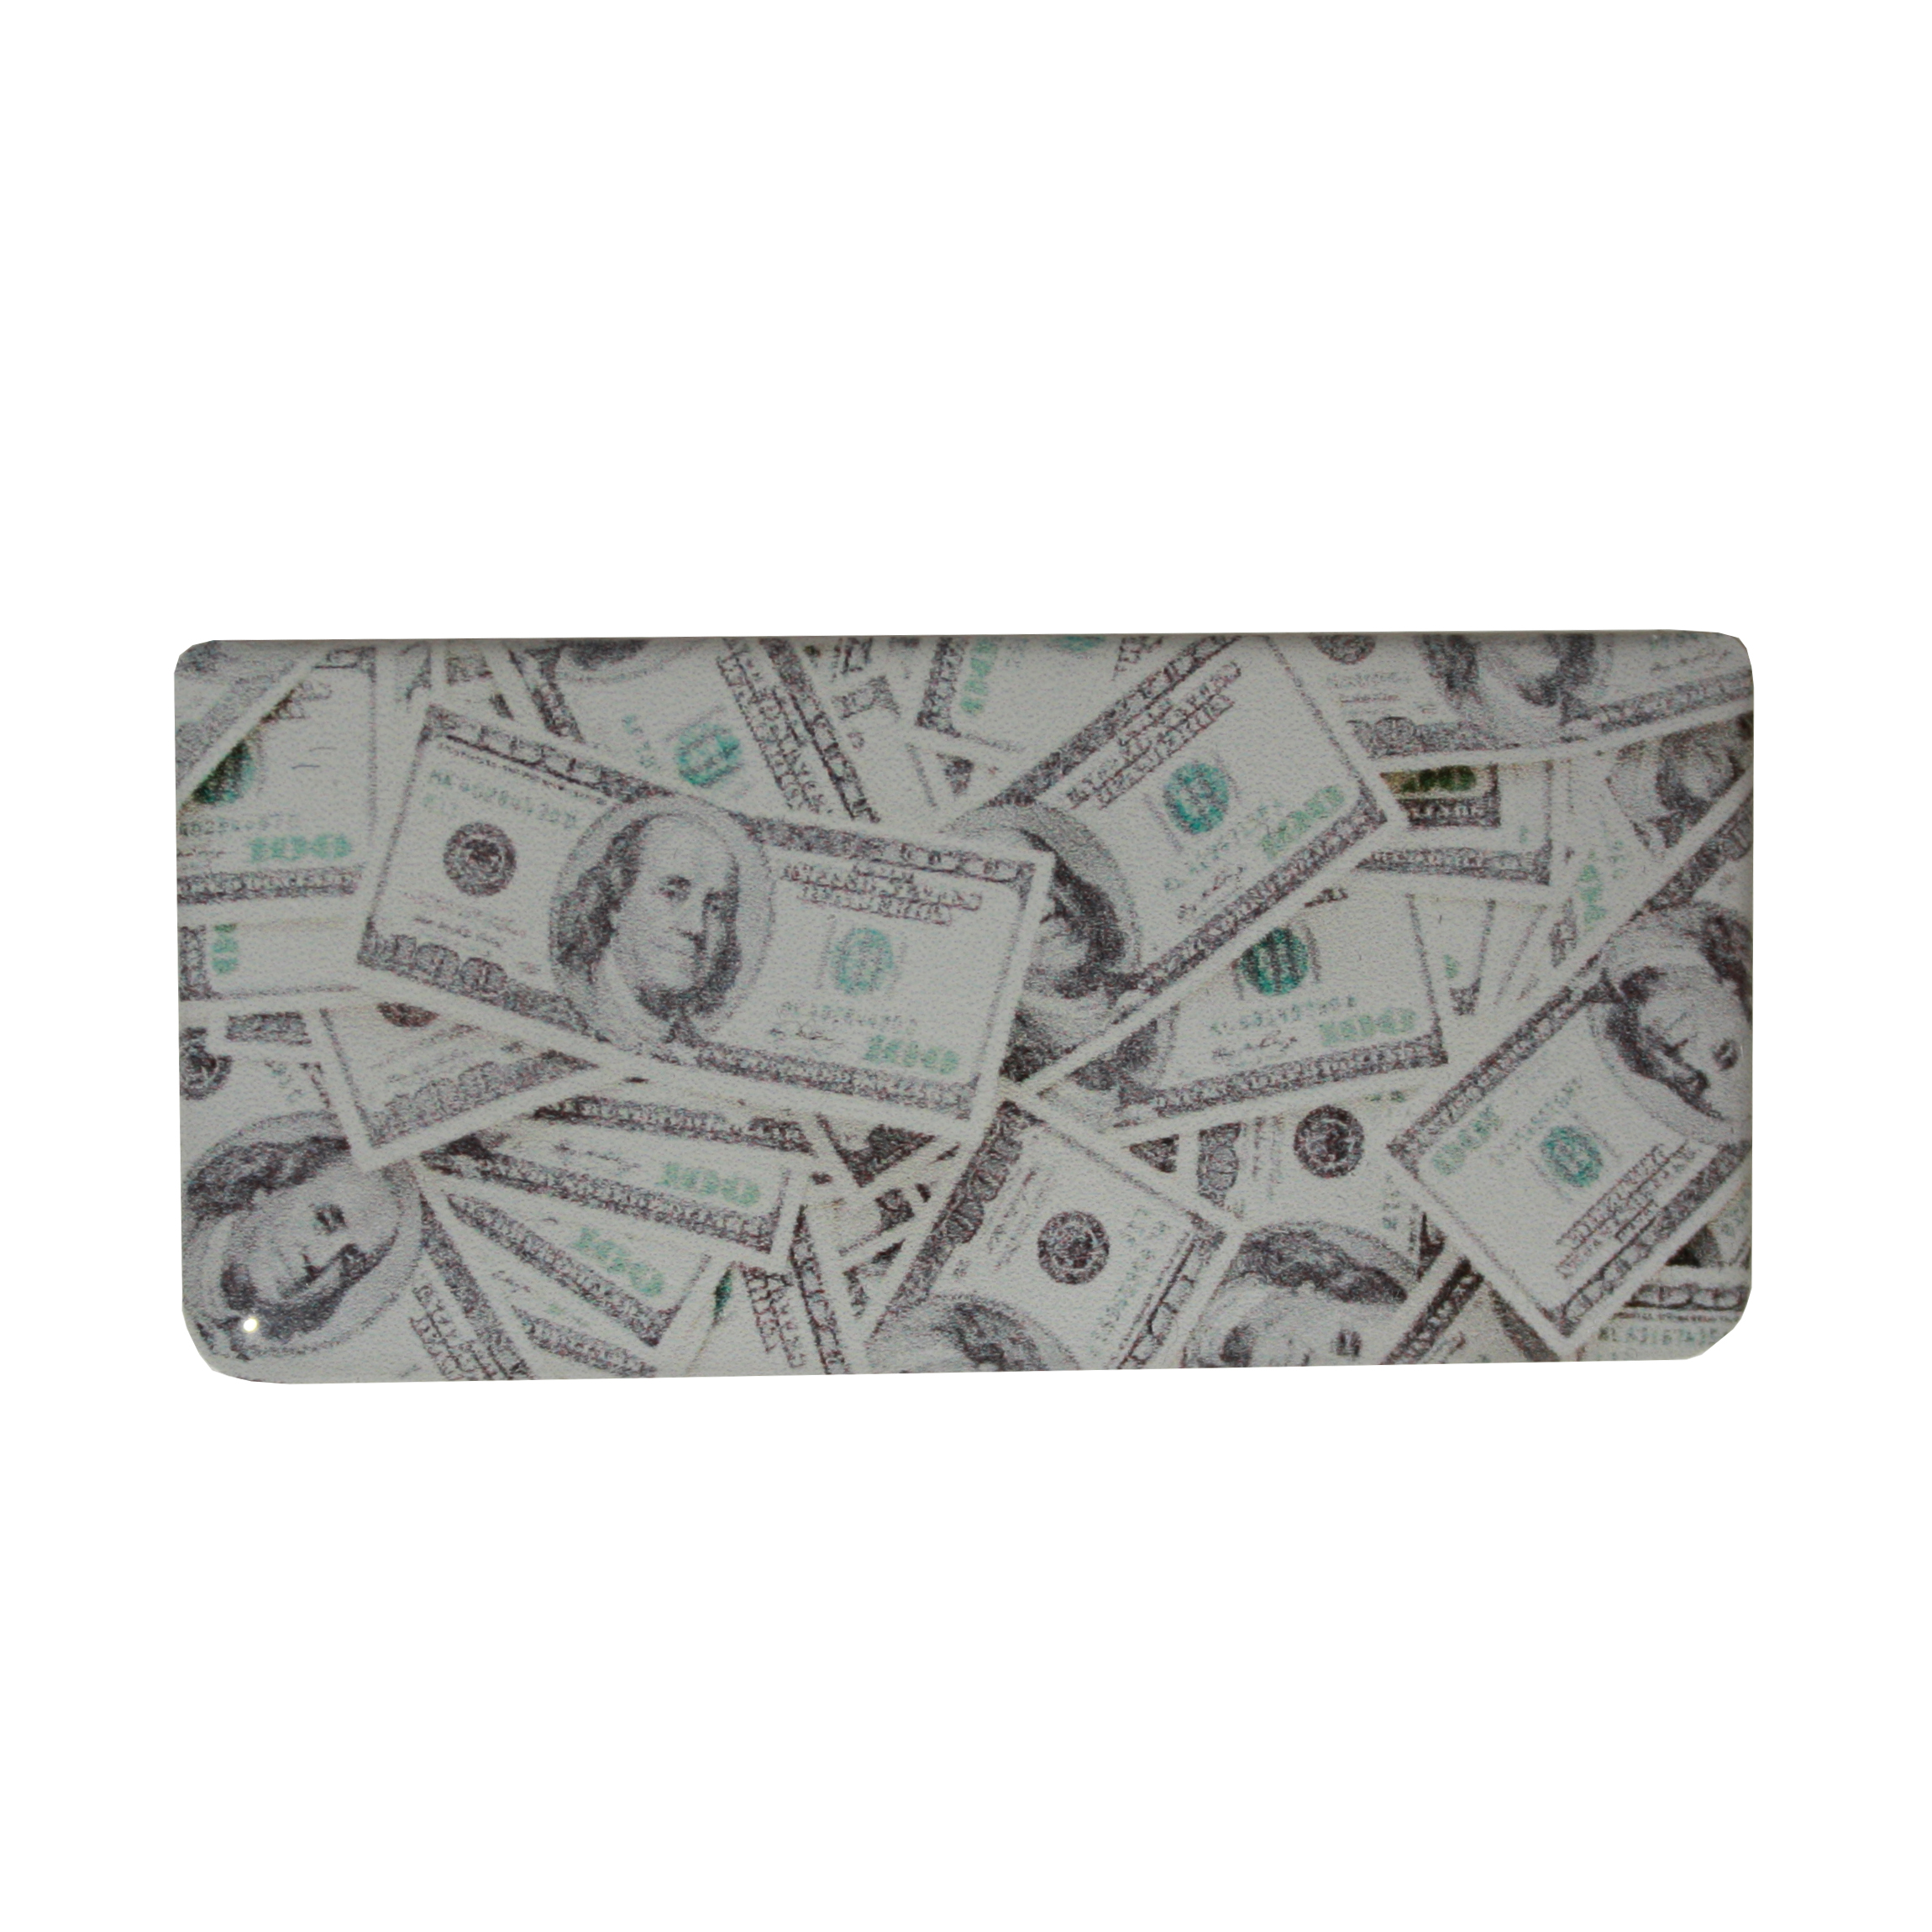 برچسب تاچ پد دسته پلی استیشن 4 مدل dollar کد 011